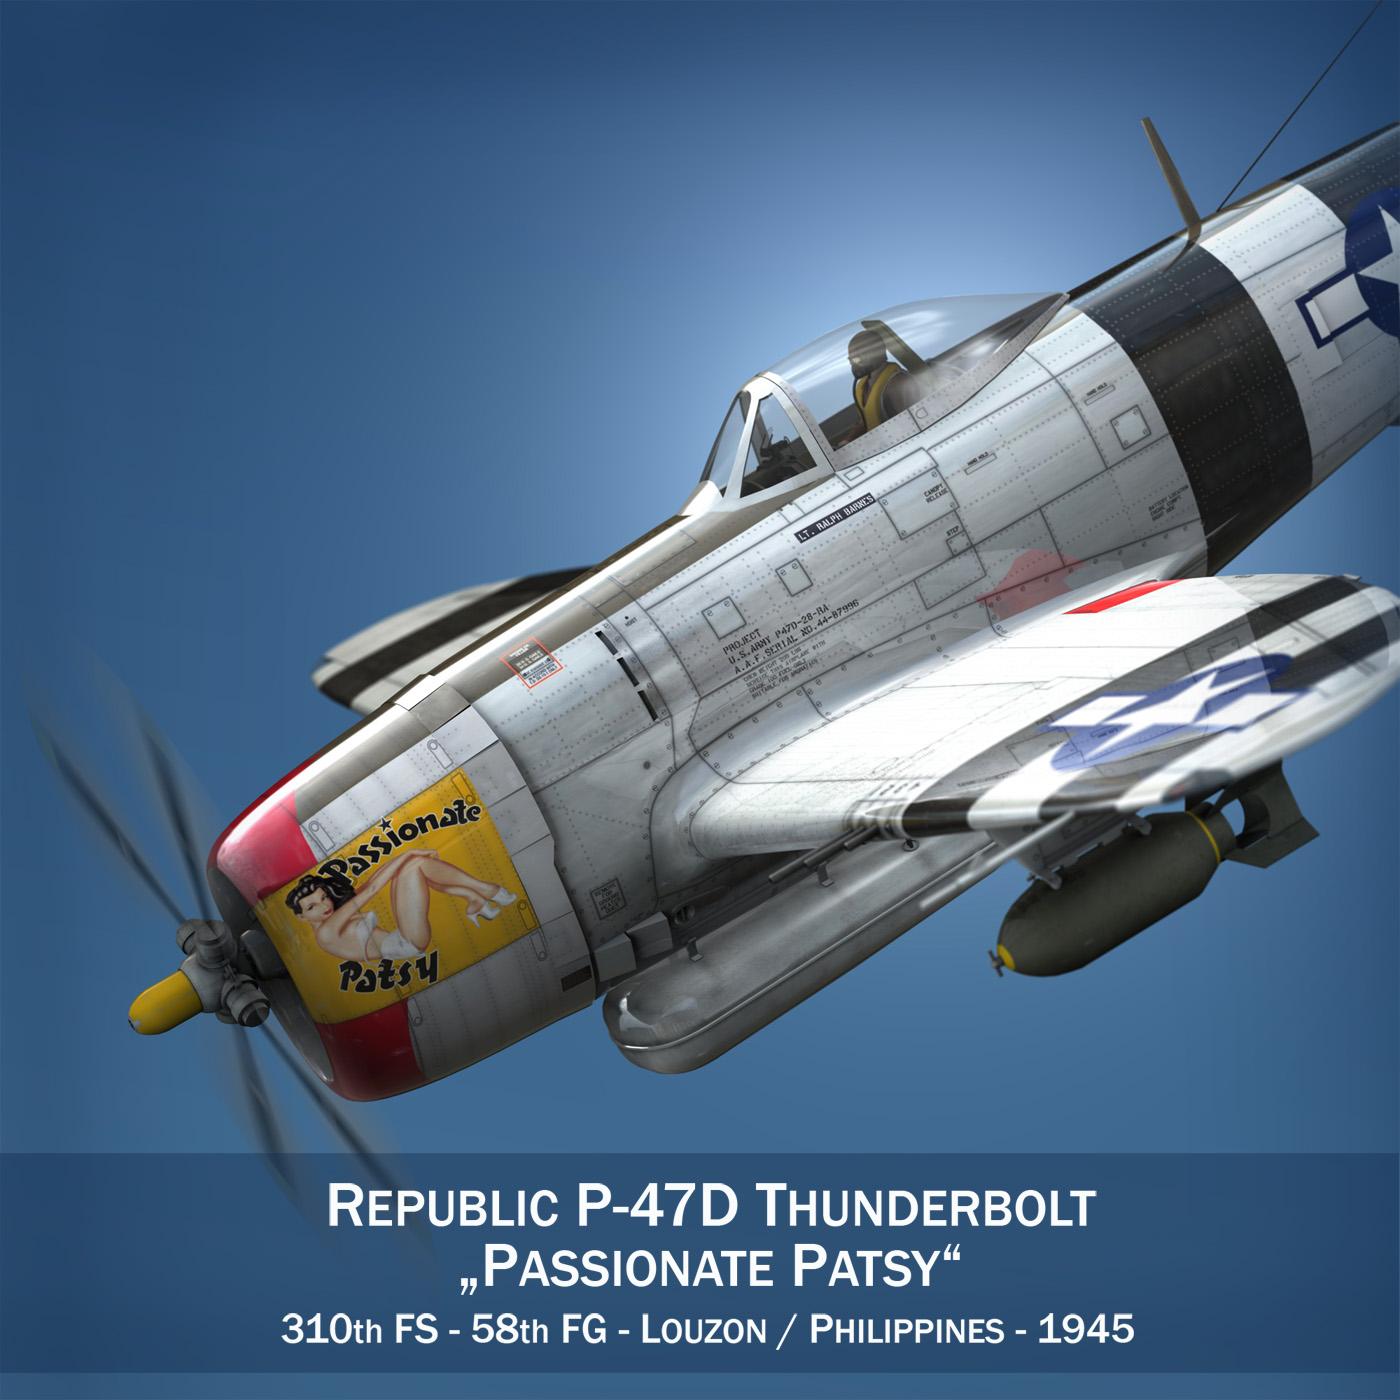 republika p-47 pērkons - kaislīgs patsy 3d fbx lwo lws objekts c4d 279740